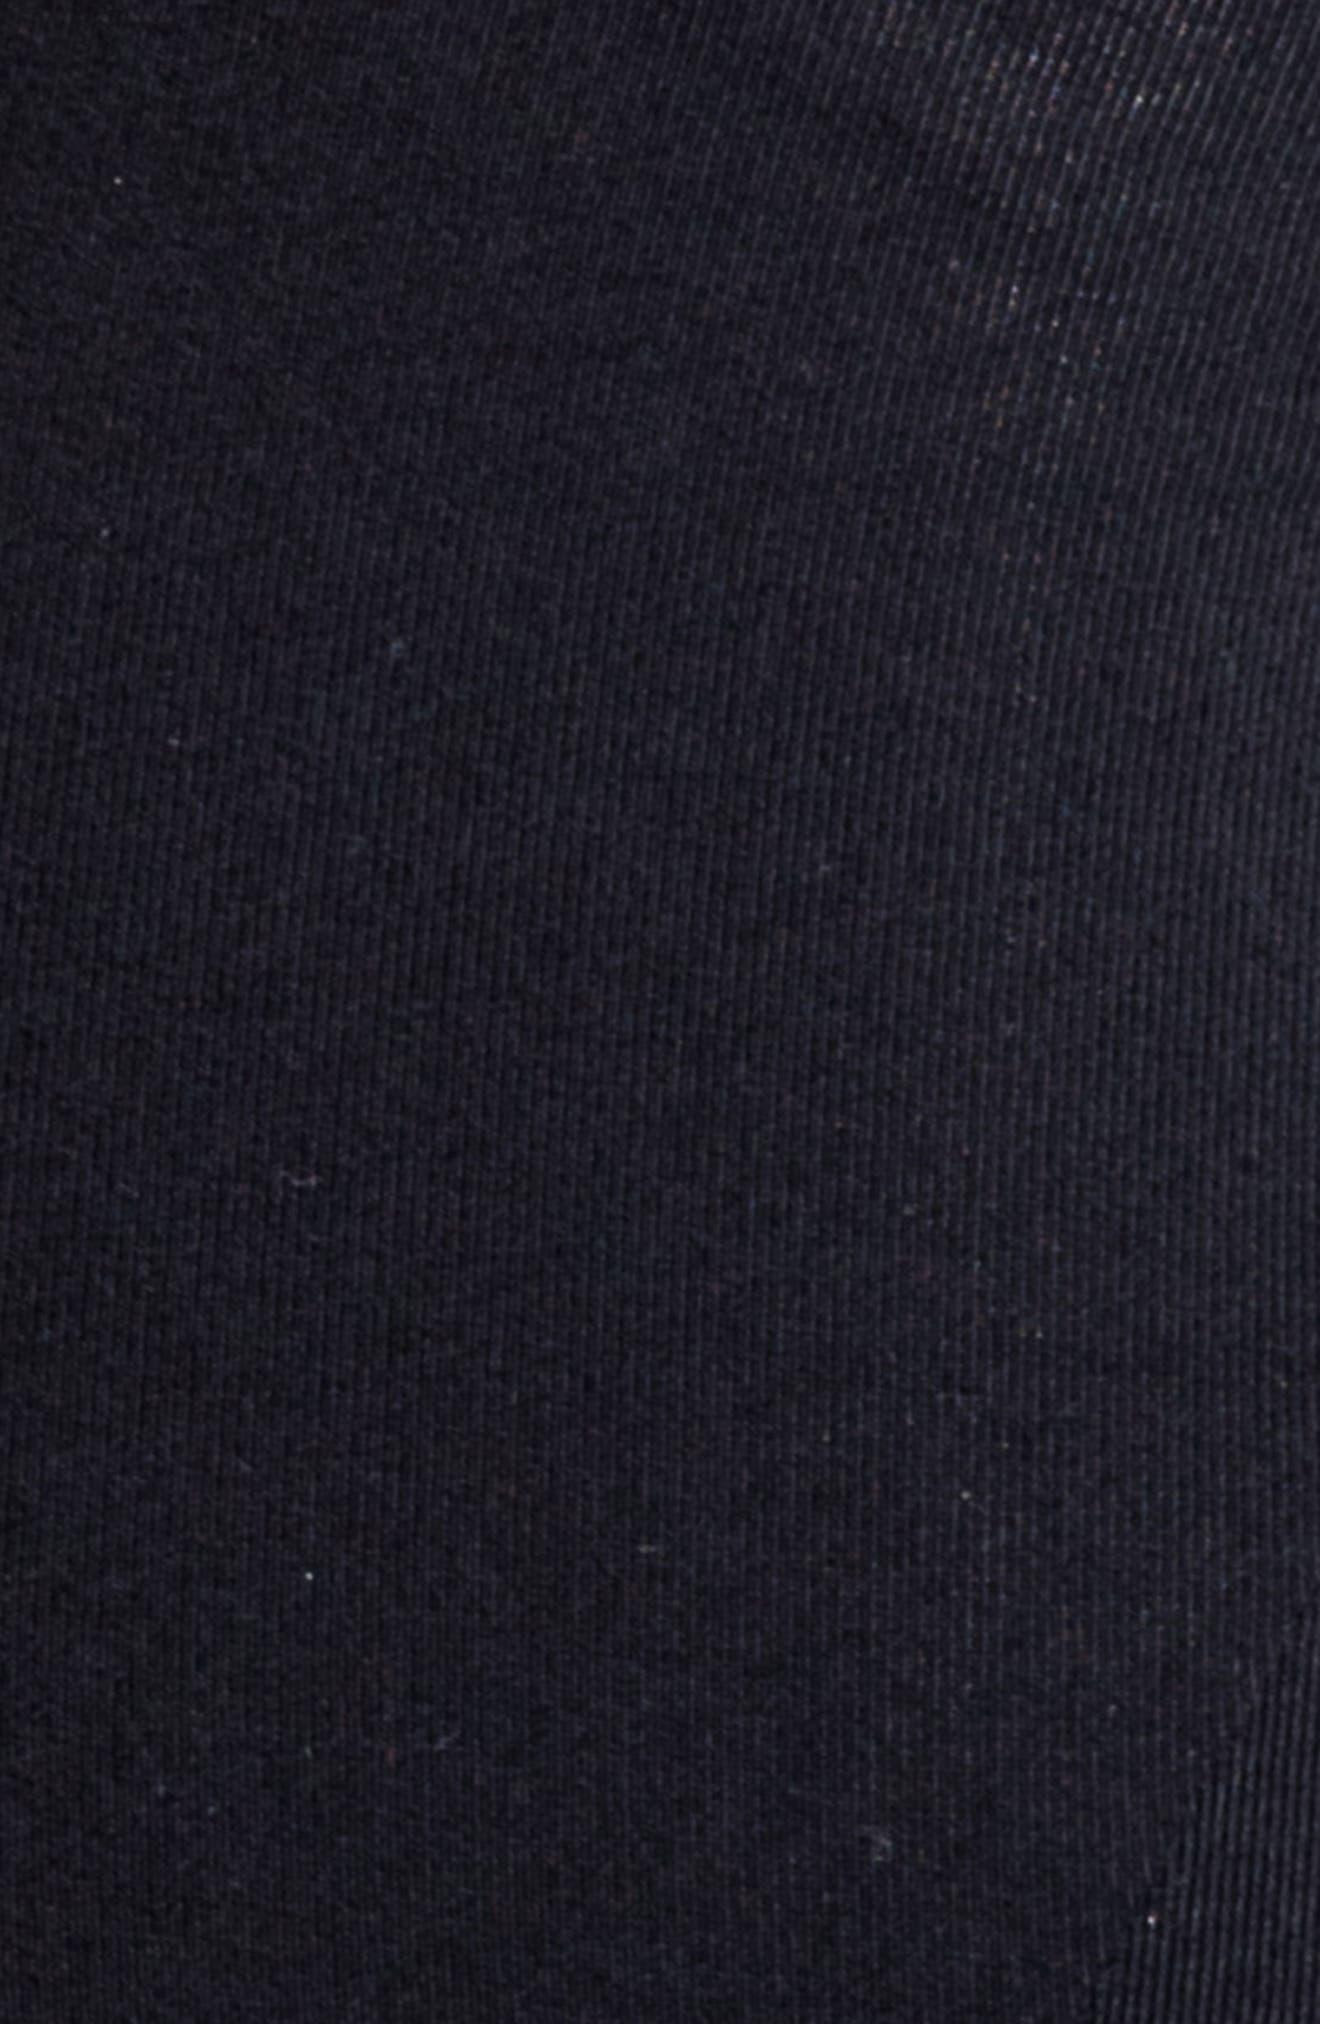 Juno Maternity Leggings,                             Alternate thumbnail 5, color,                             BLACK